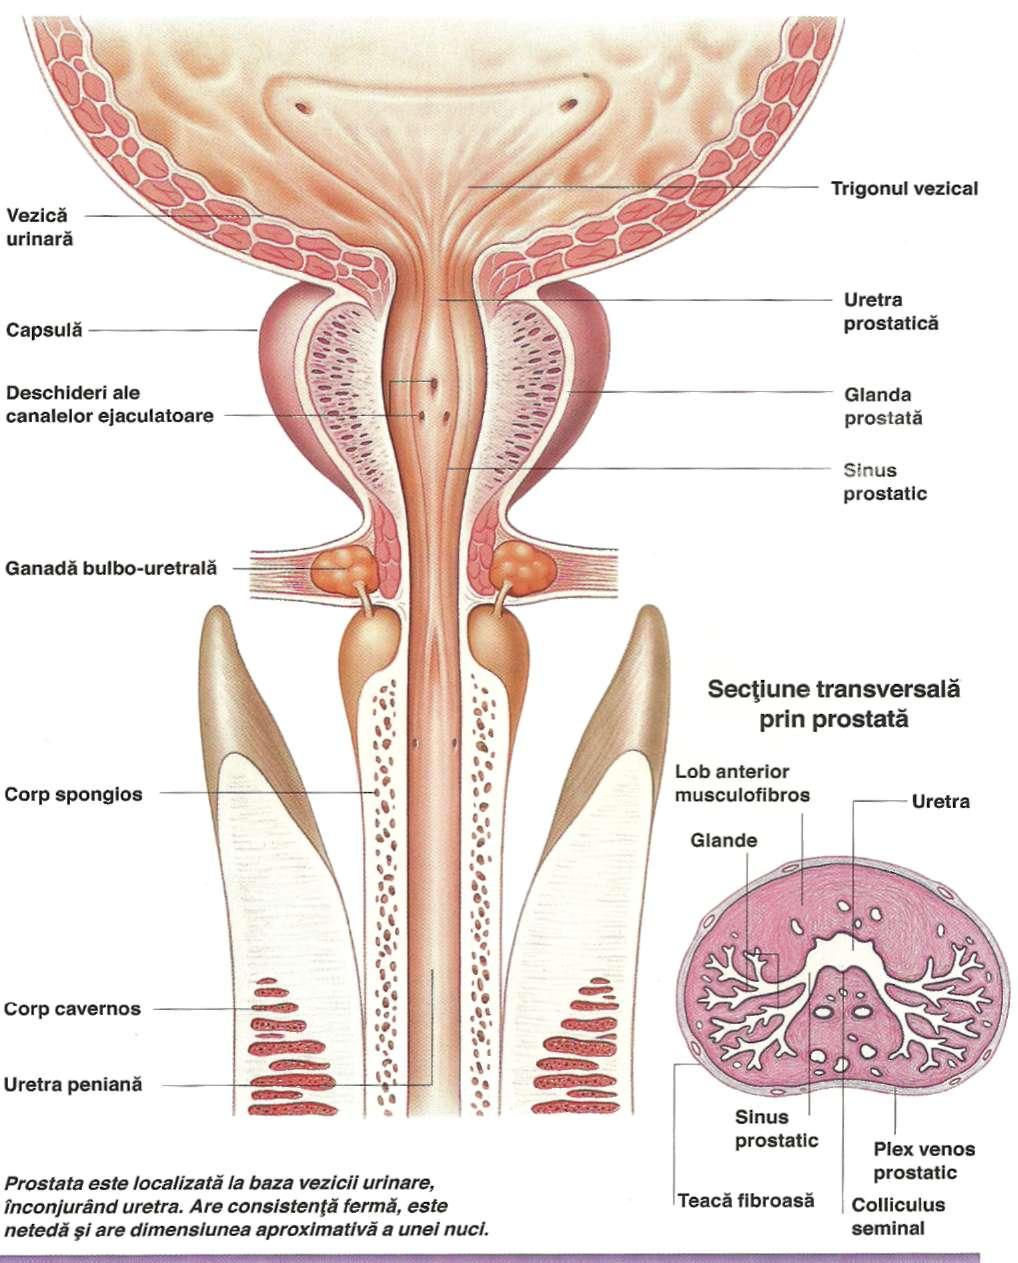 Anatomie urogenital adenom de prostata imagini